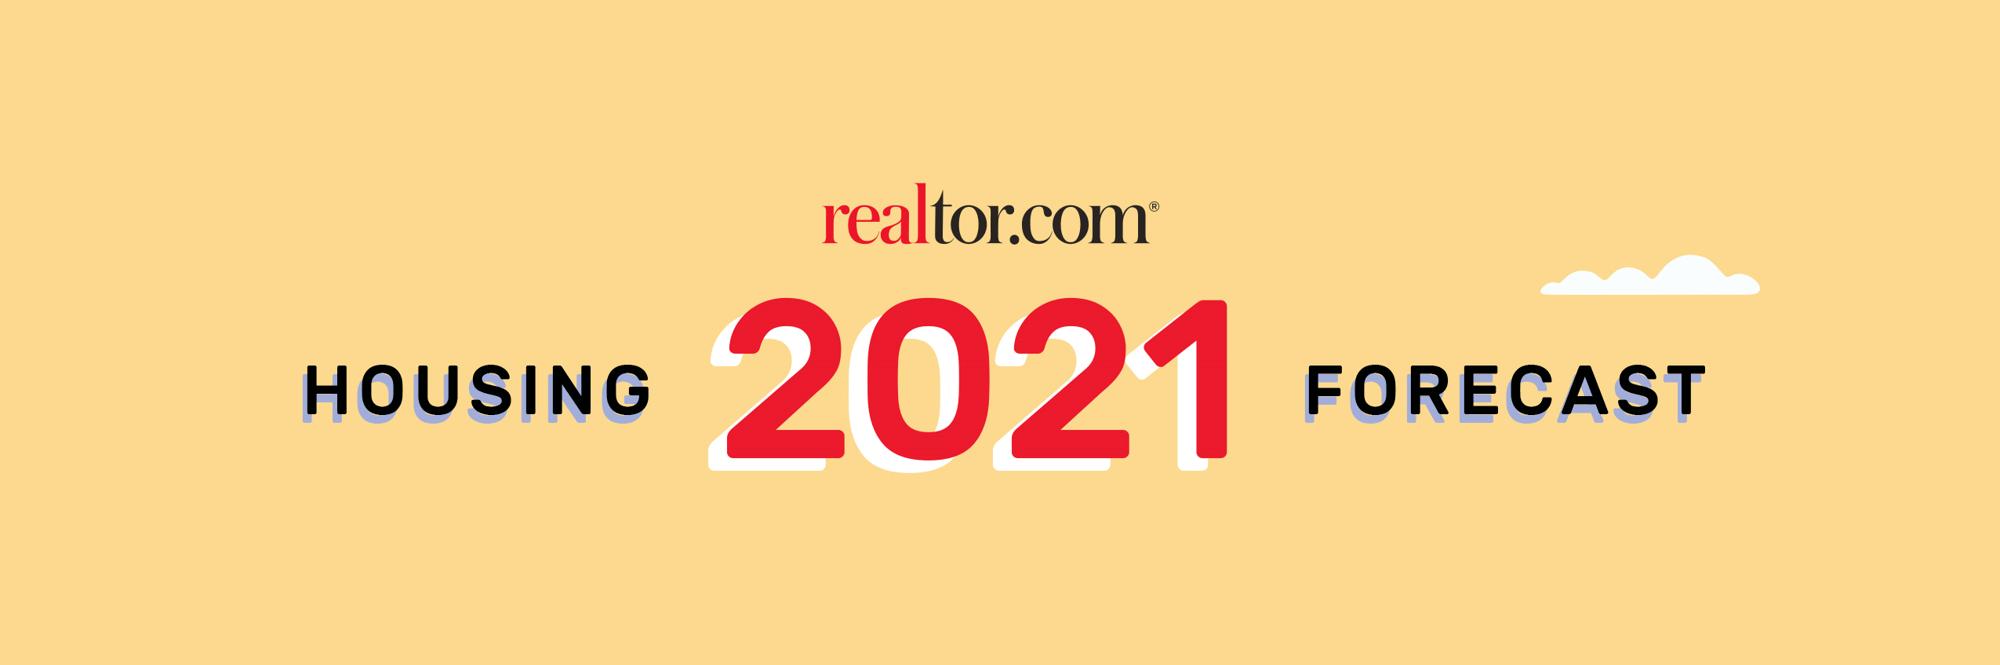 Housing 2021 Forecast